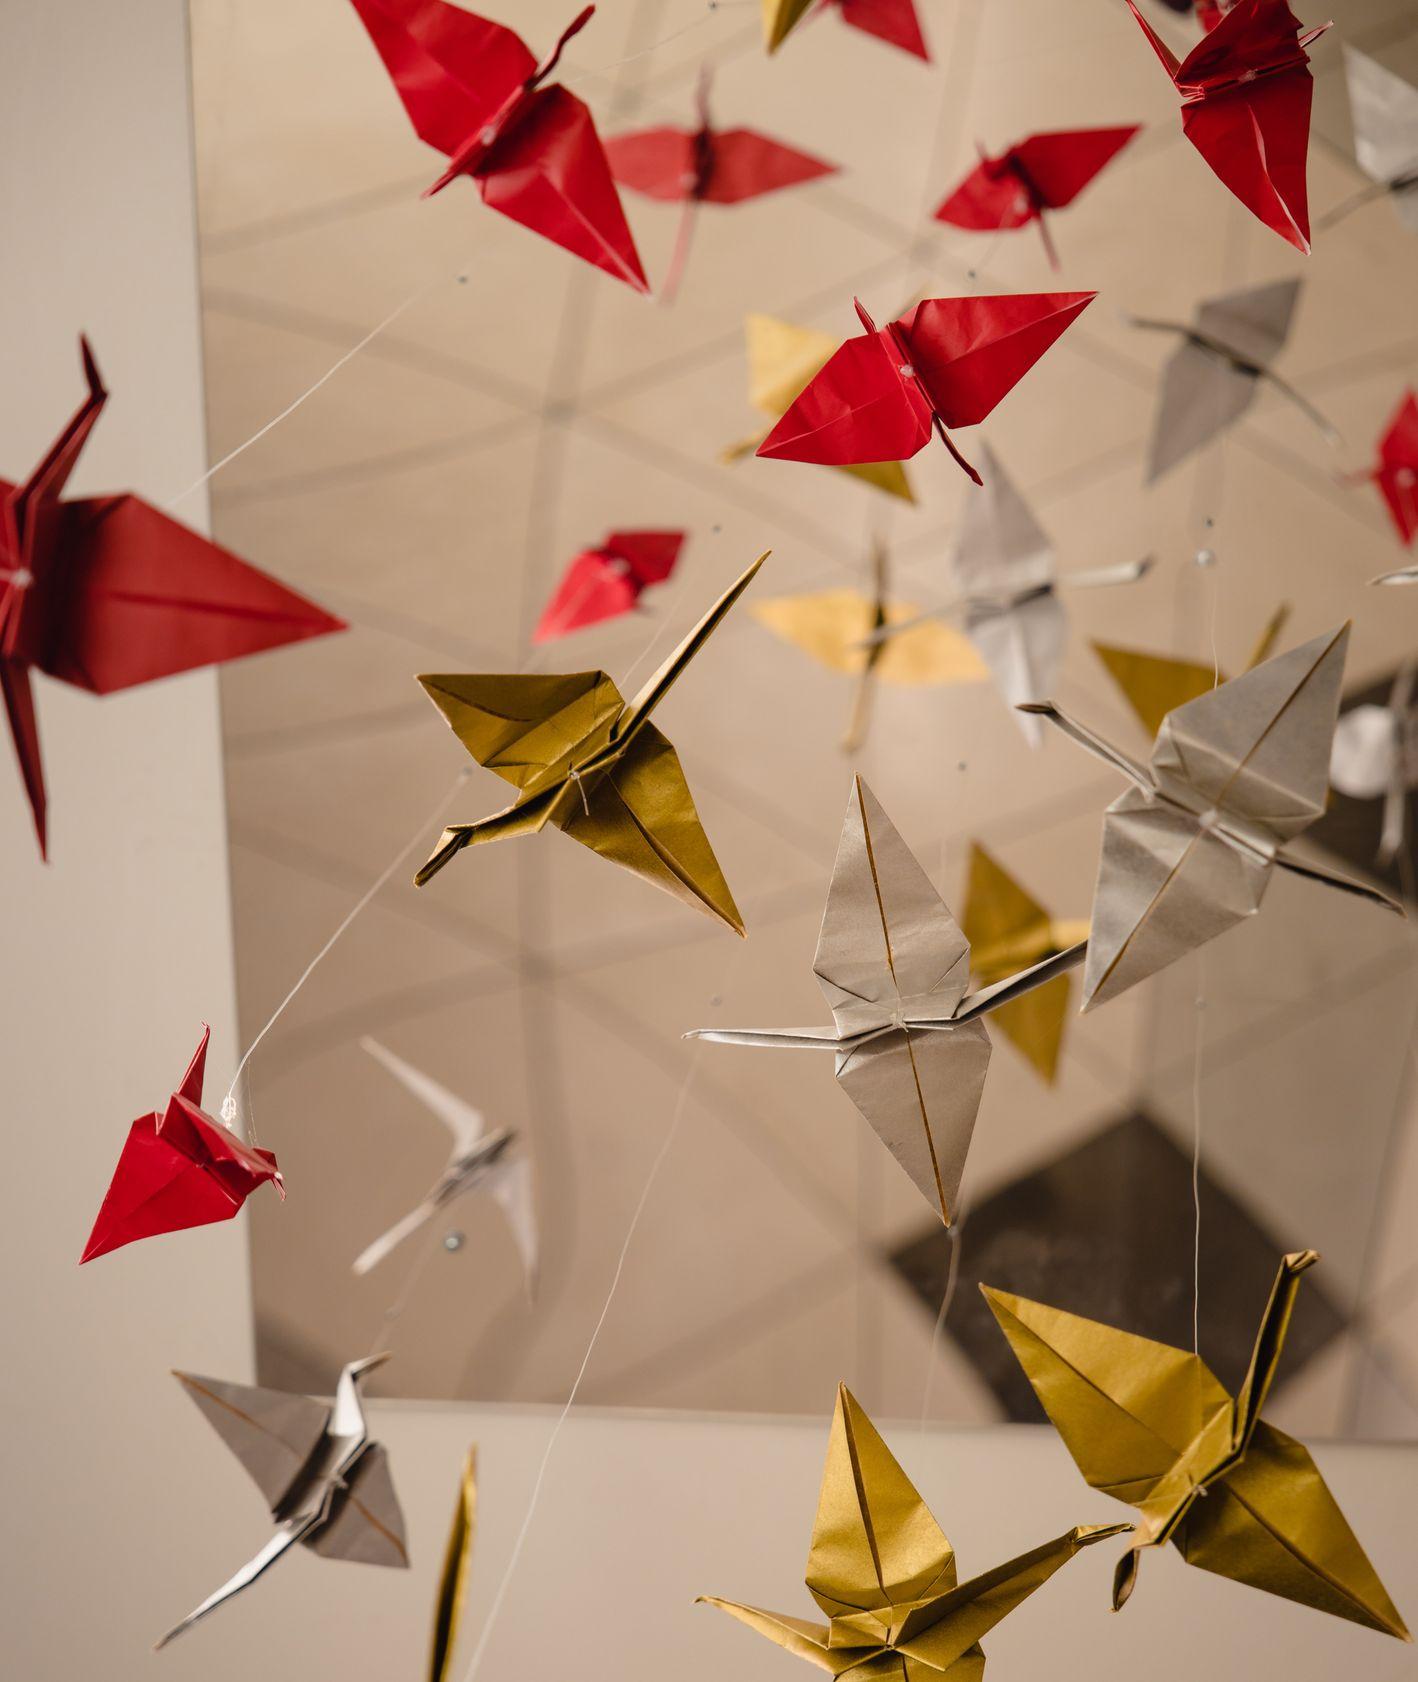 Ptaki z origami podwieszone pod sufitem (fot. Jason Leung / unsplash.com)